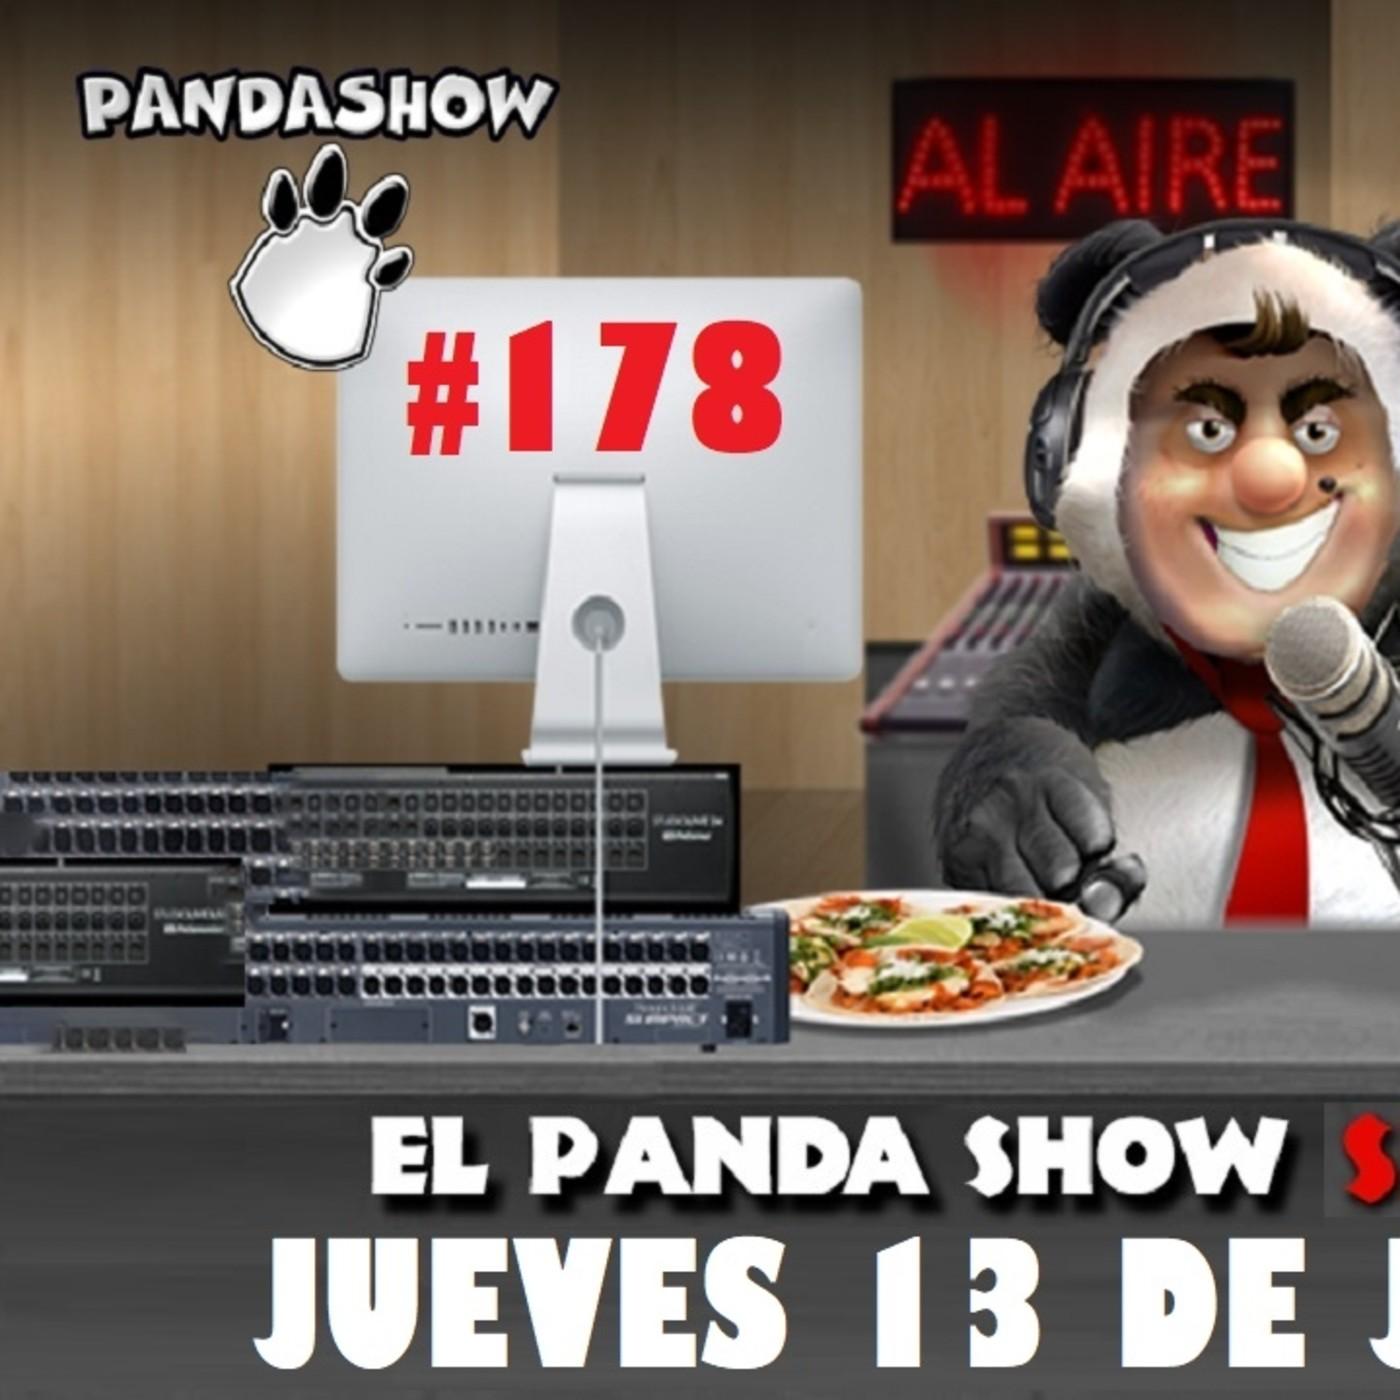 PANDA SHOW Ep. 178 JUEVES 13 DE JUNIO 2019